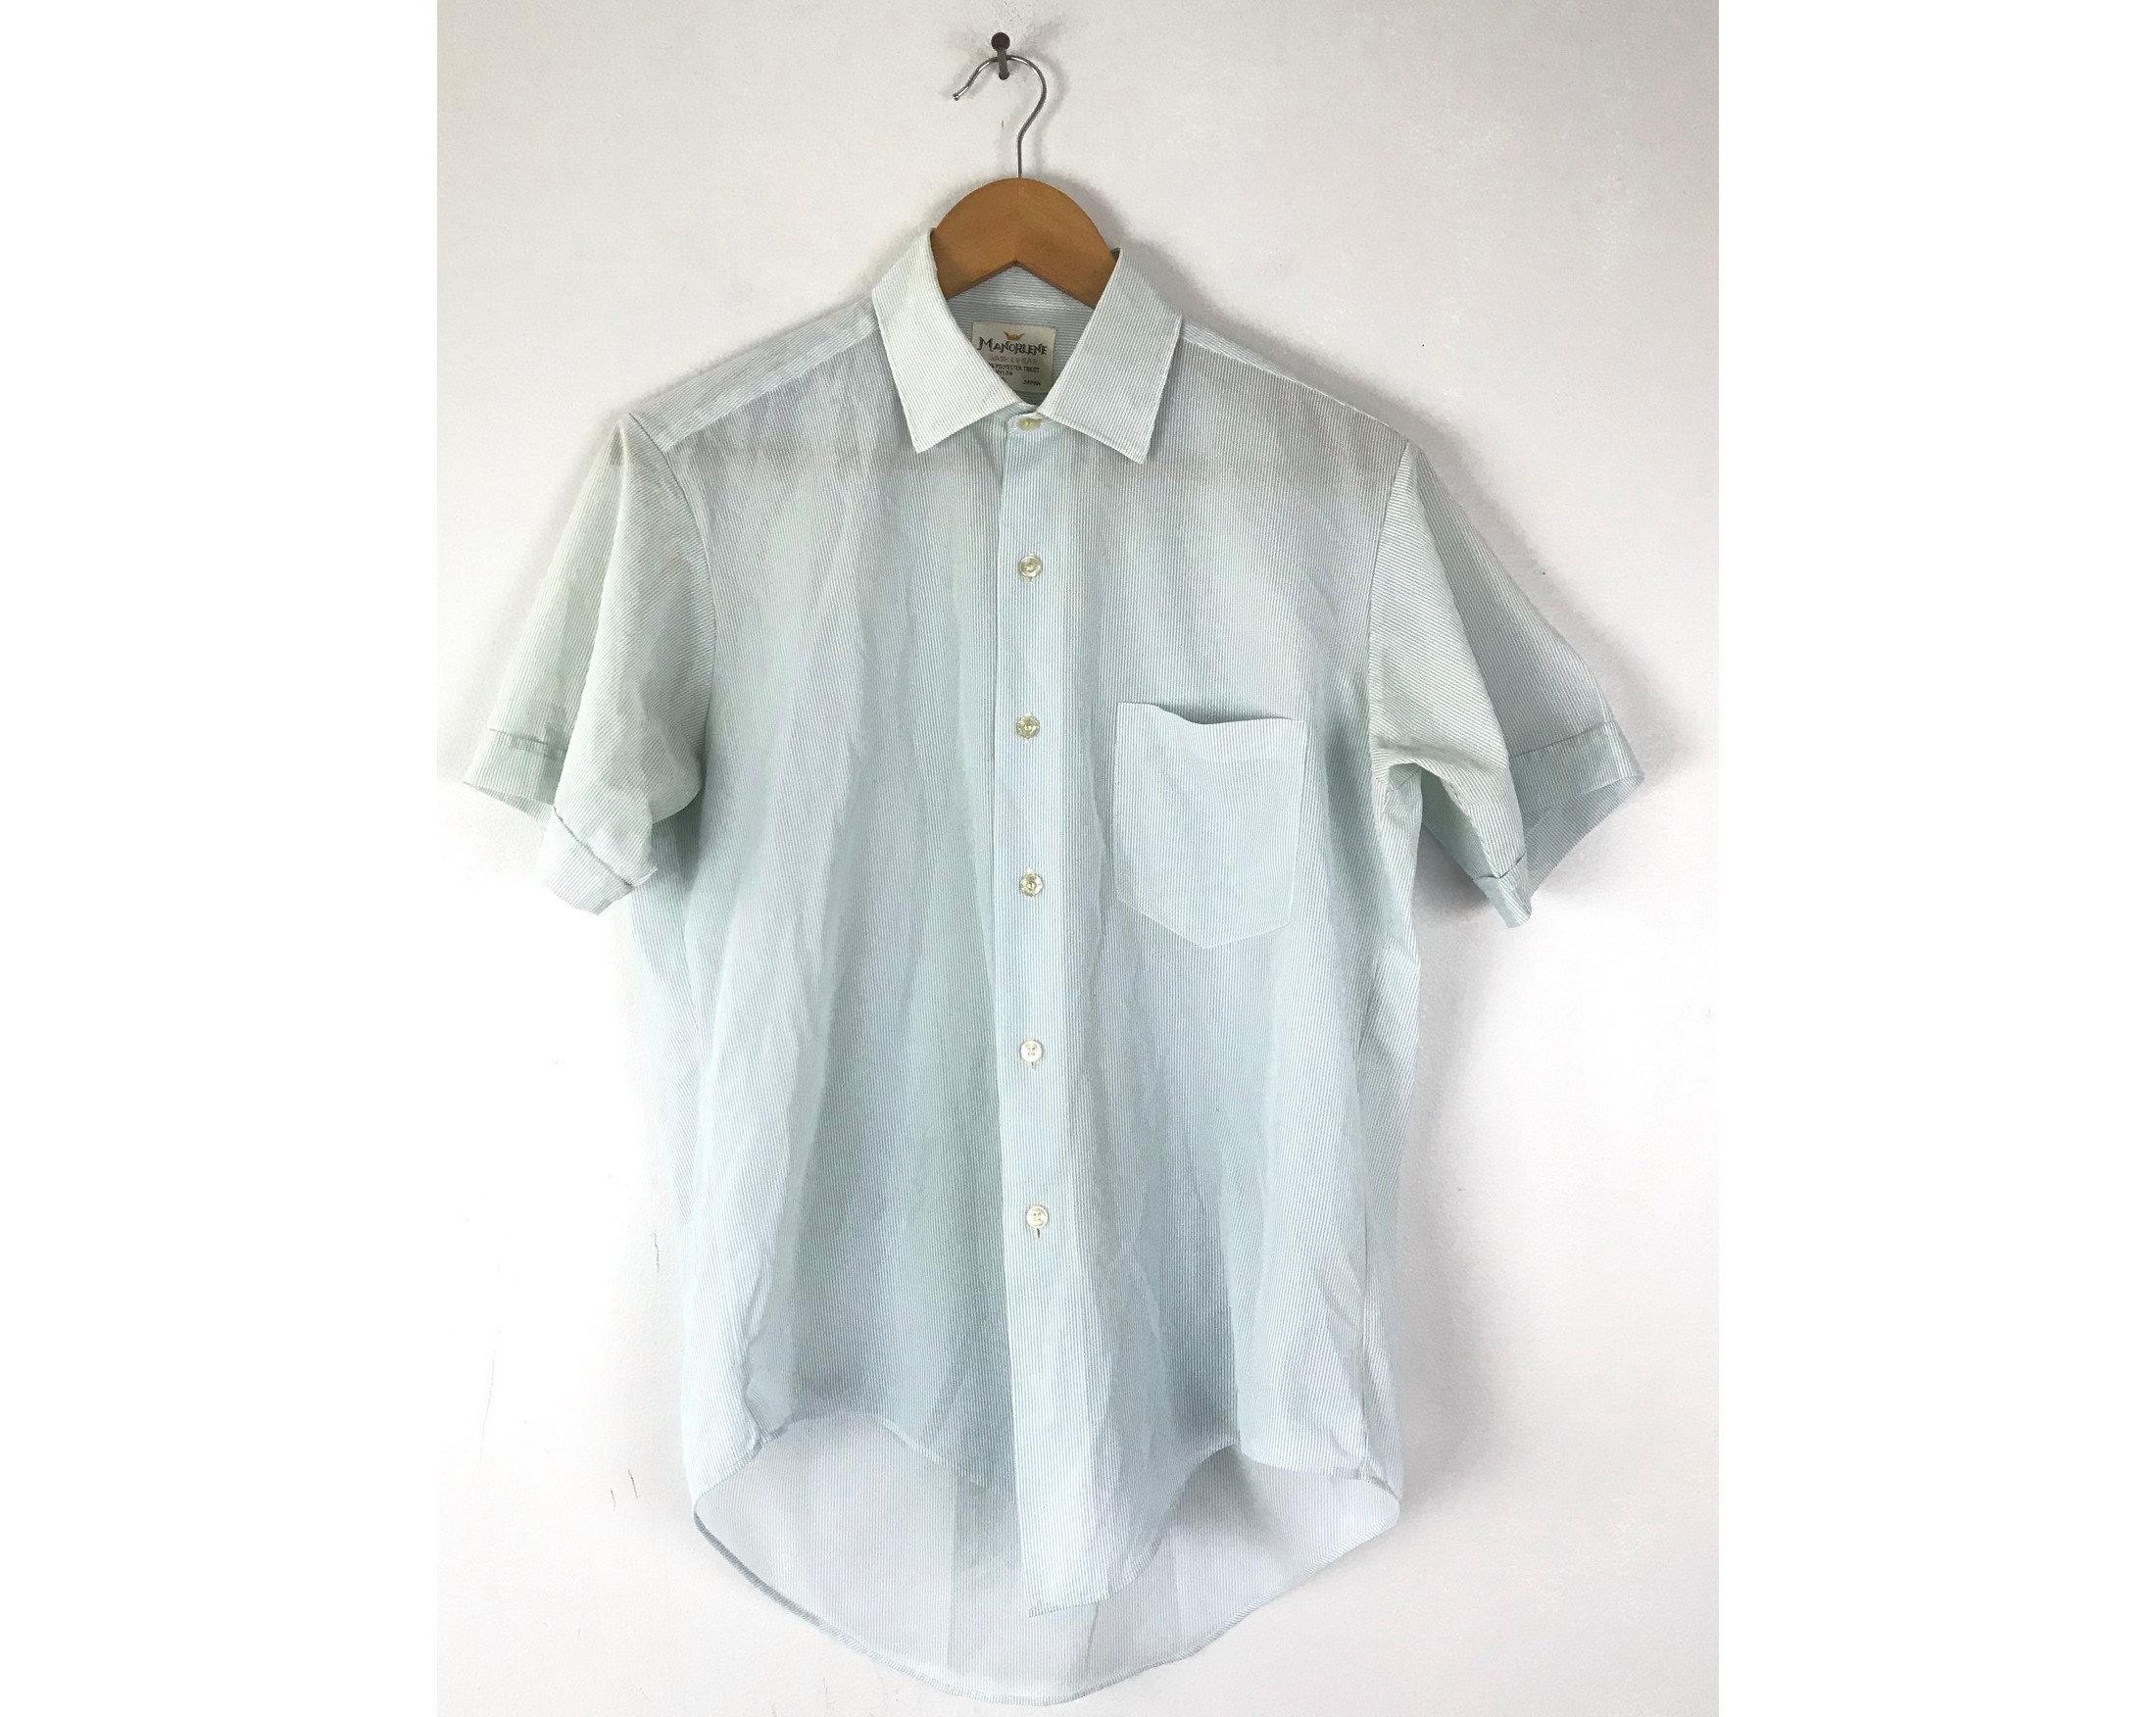 1970s Mens Shirt Styles – Vintage 70s Shirts for Guys Vintage Mens Pinstripe Shirt, Light Blue  White Pinstriped Sheer Shirt Medium, 1970S Button Down Short Sleeve Shirt, Retro Disco $26.00 AT vintagedancer.com